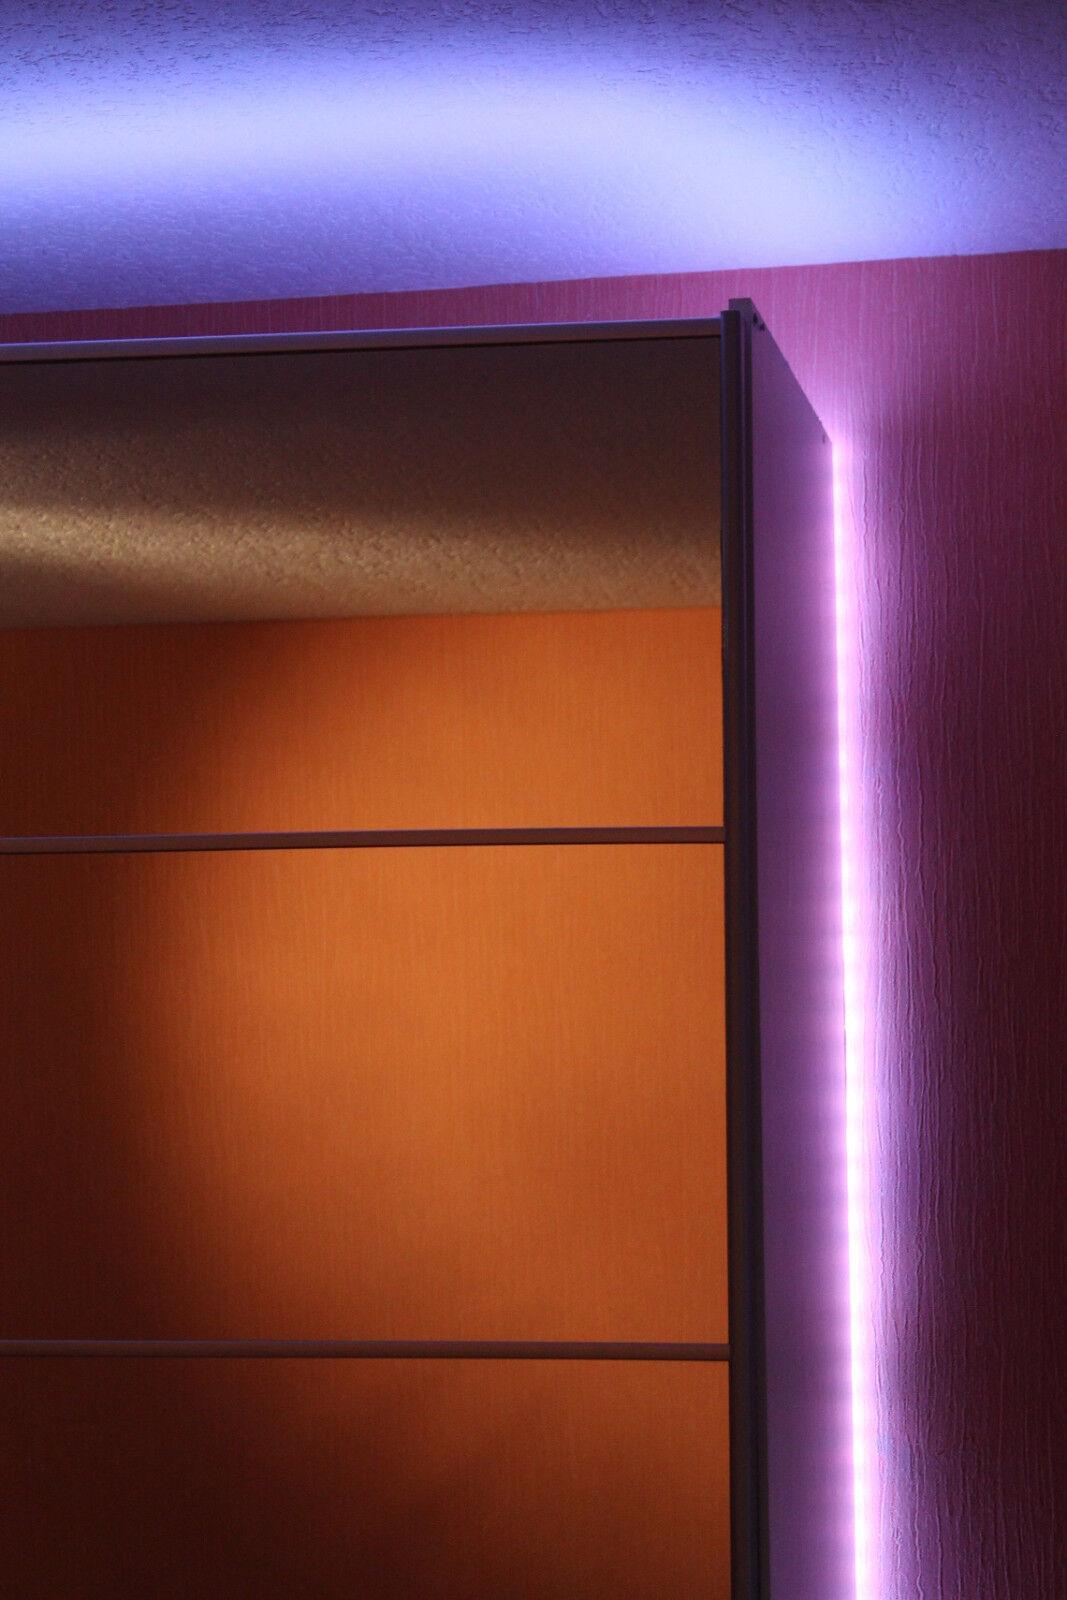 RGB LED Strip Band Leiste 5 Meter mit 150 LEDs - Komplettset mit Fernbedienung